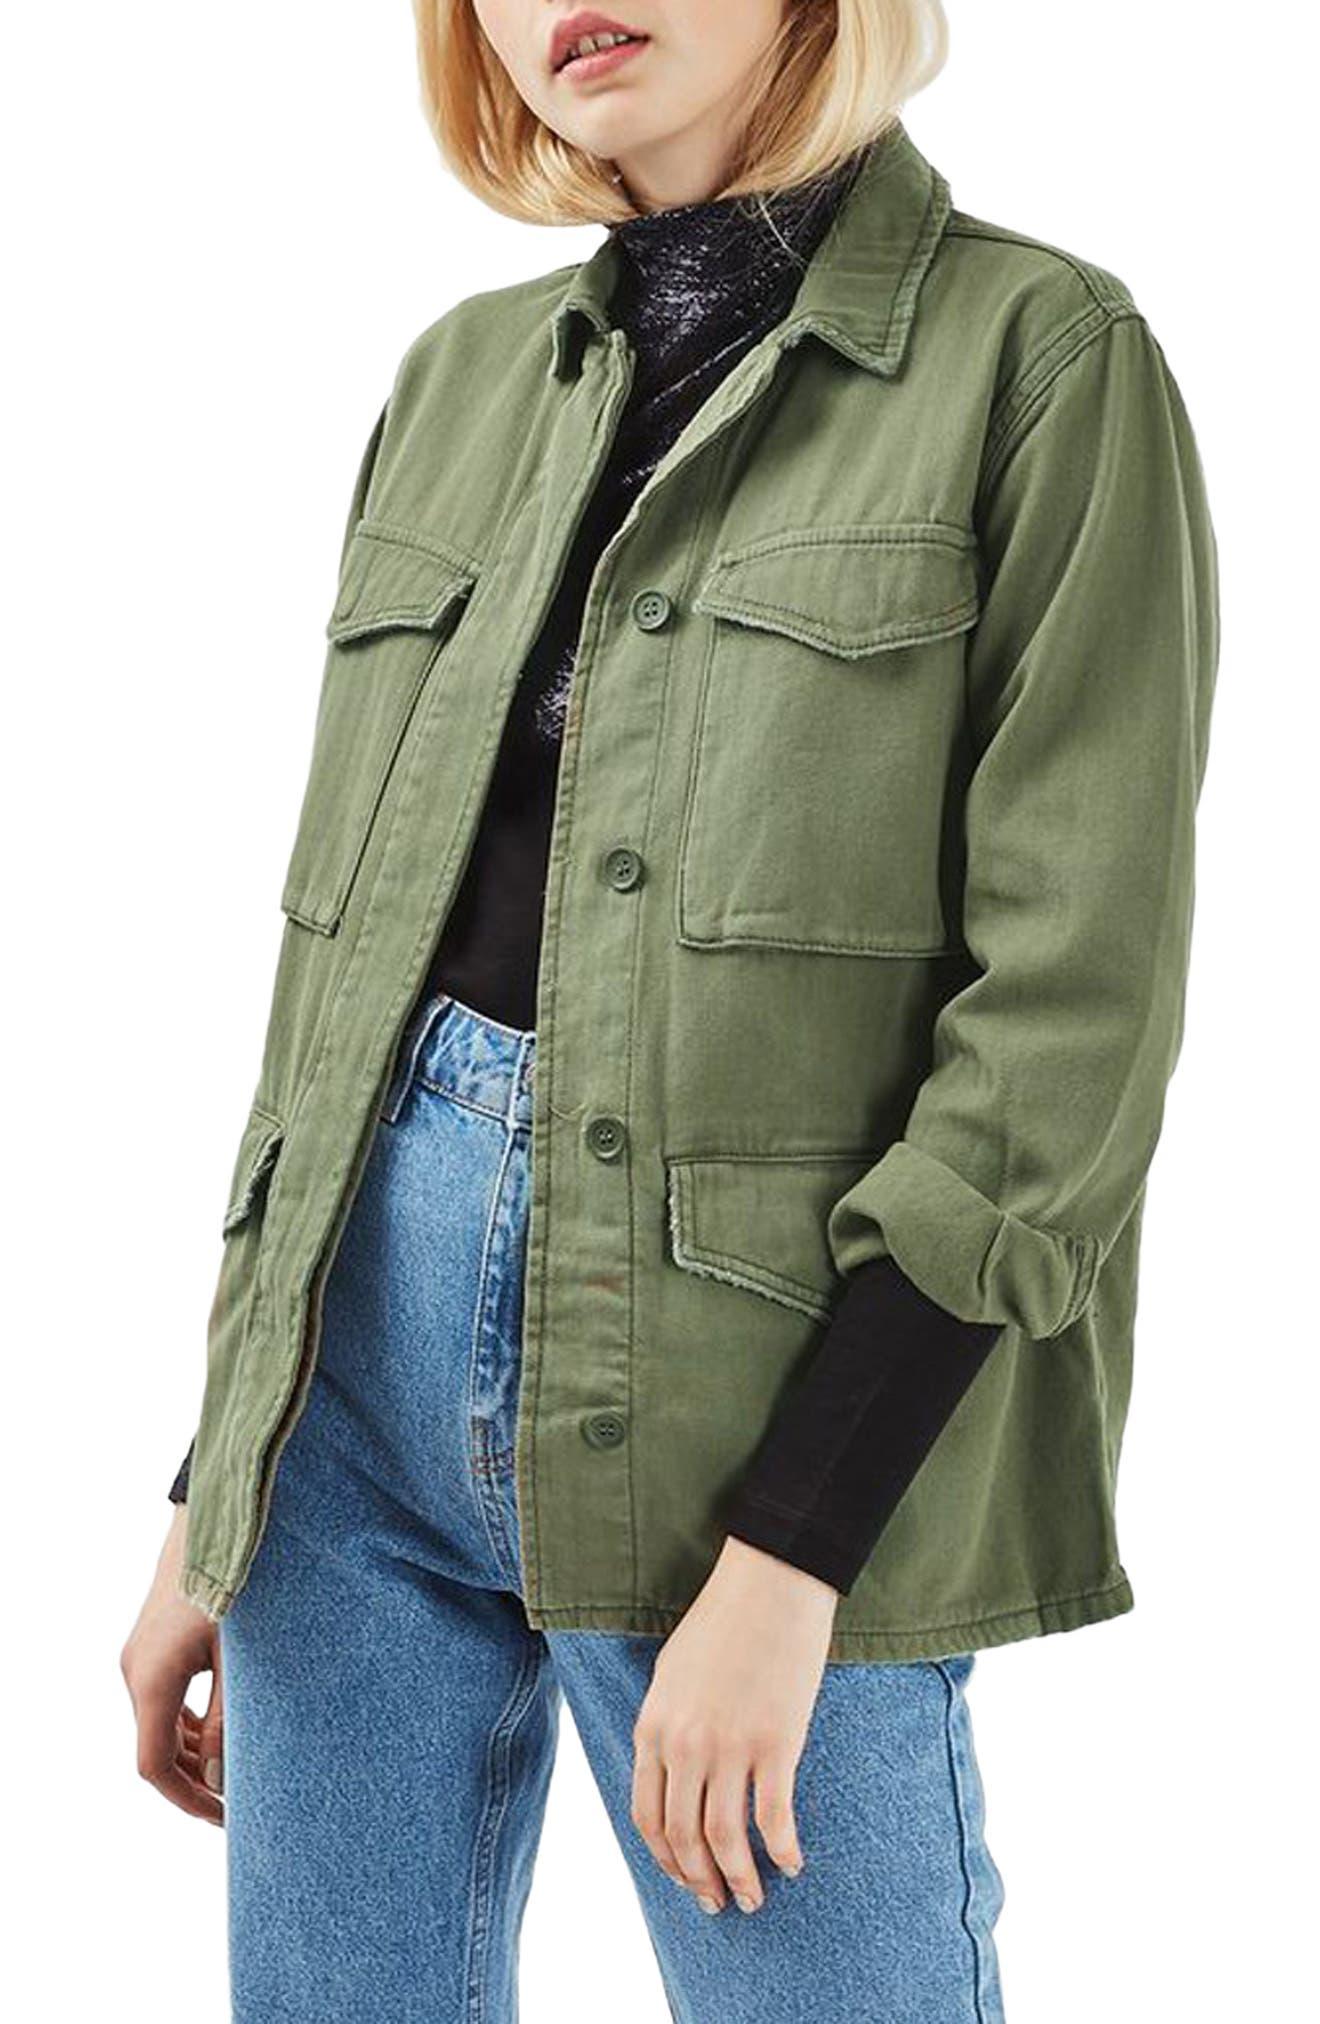 Topshop Ethan Shirt Jacket